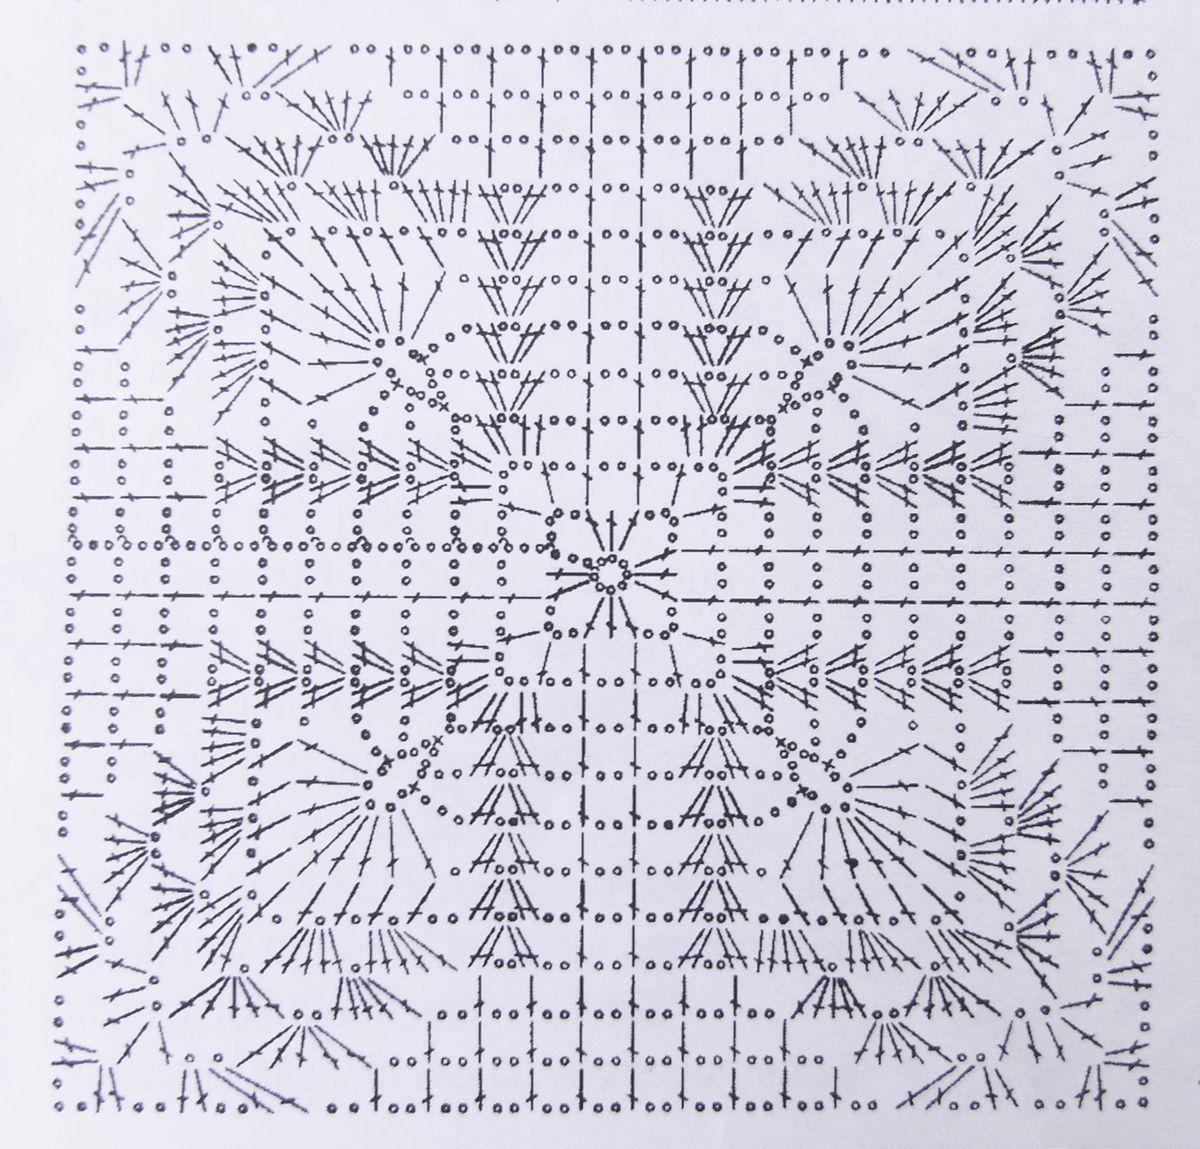 f9115fd04a3e2a1ef3220b3caeee2c02.jpg (1200×1149) | crochet ...